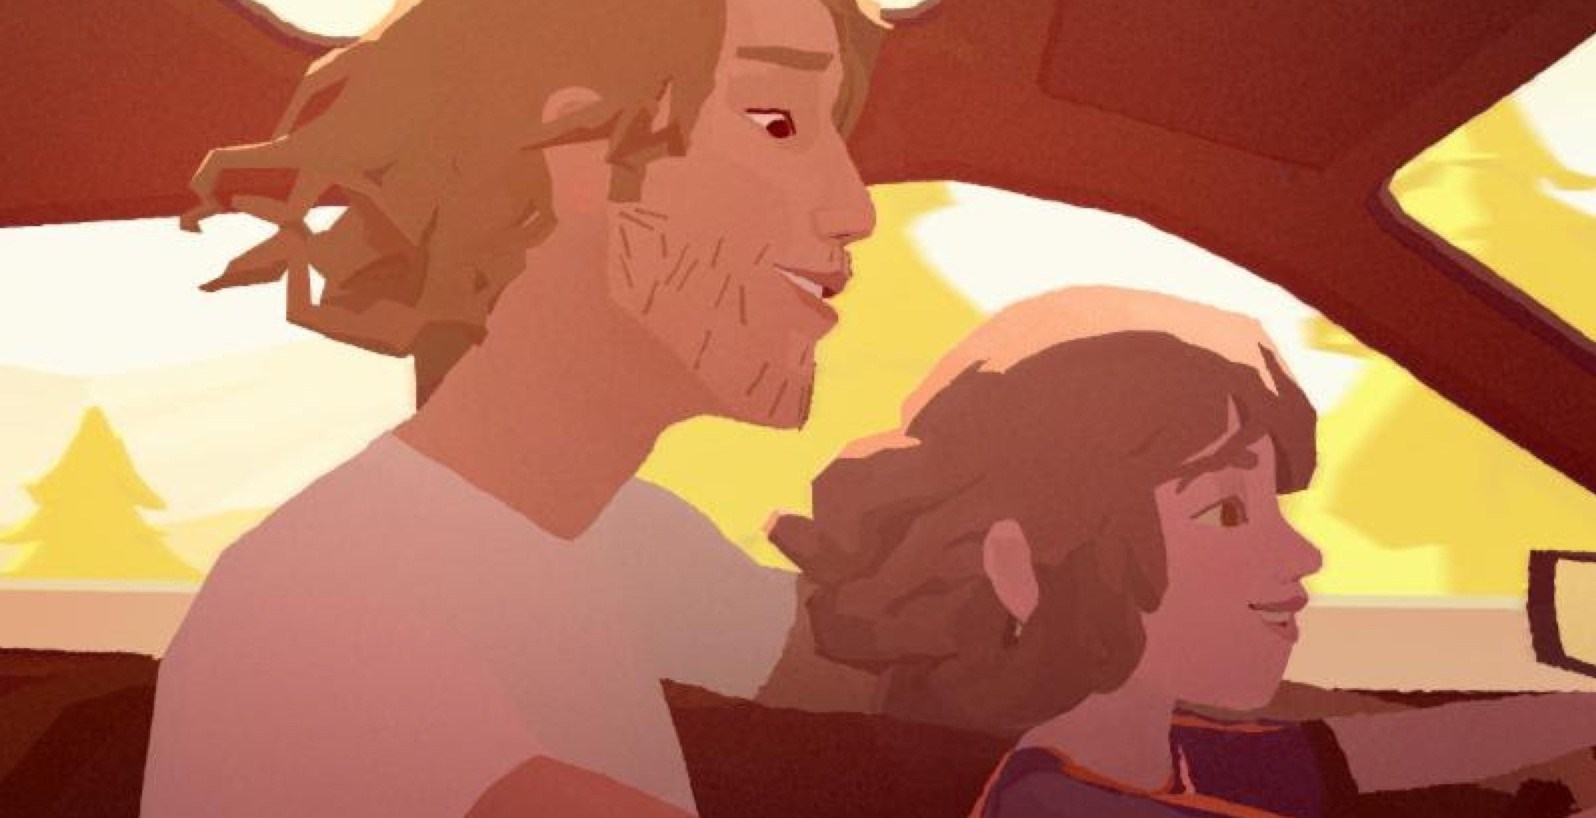 (Image: slashfilm.com)